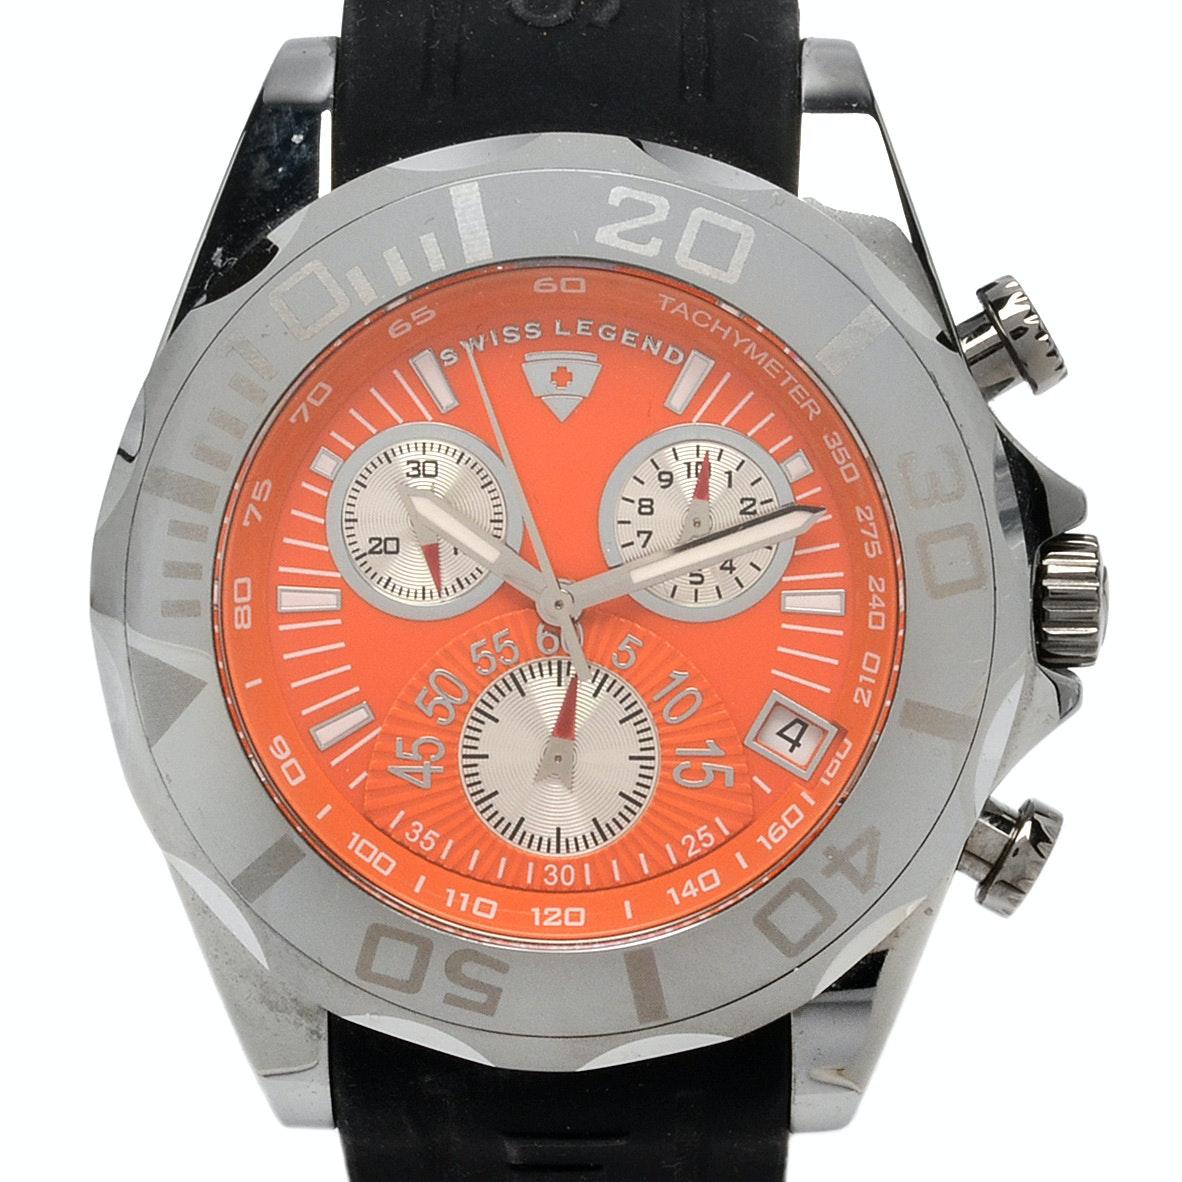 Swiss Legend Tungsten Chronograph with Orange Dial